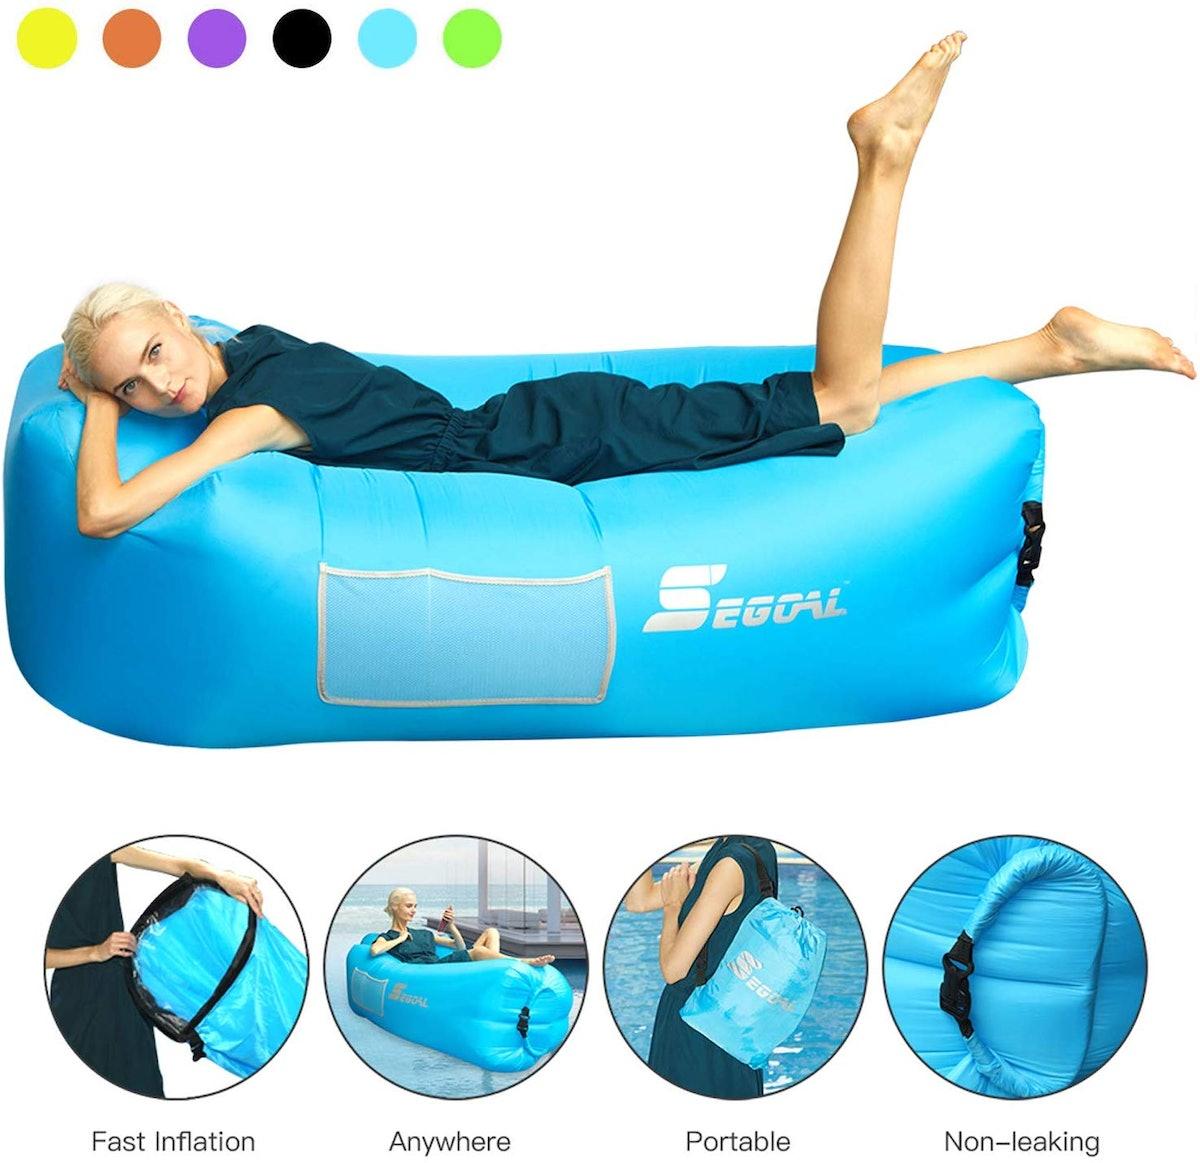 SEGOAL Inflatable Lounger